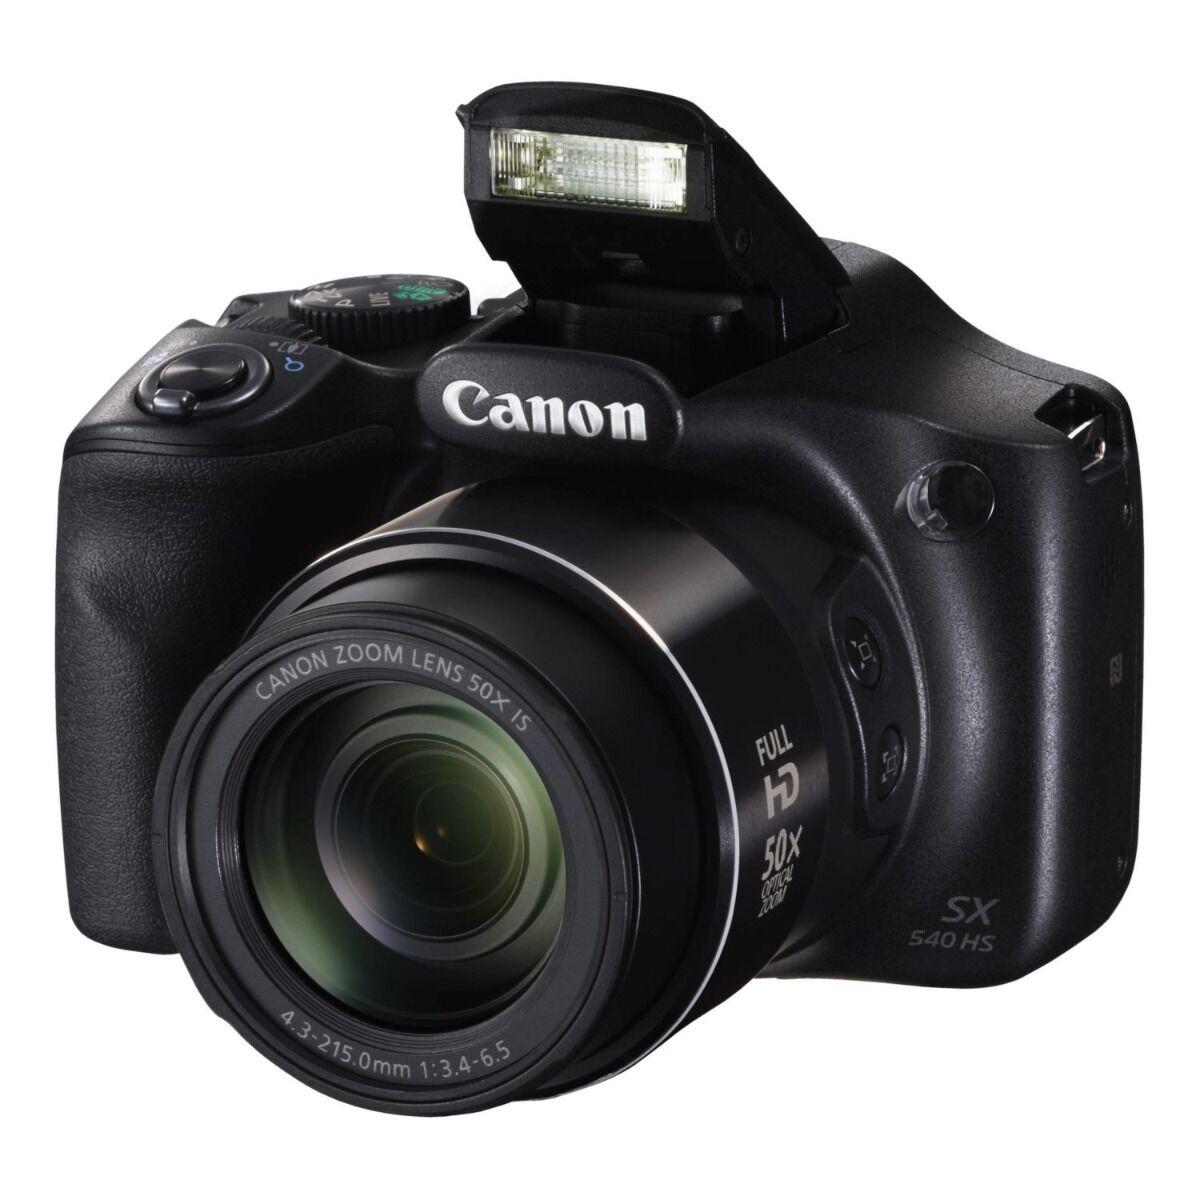 Canon PowerShot SX540 HS - BLACK FRIDAY SUMMER WEEK